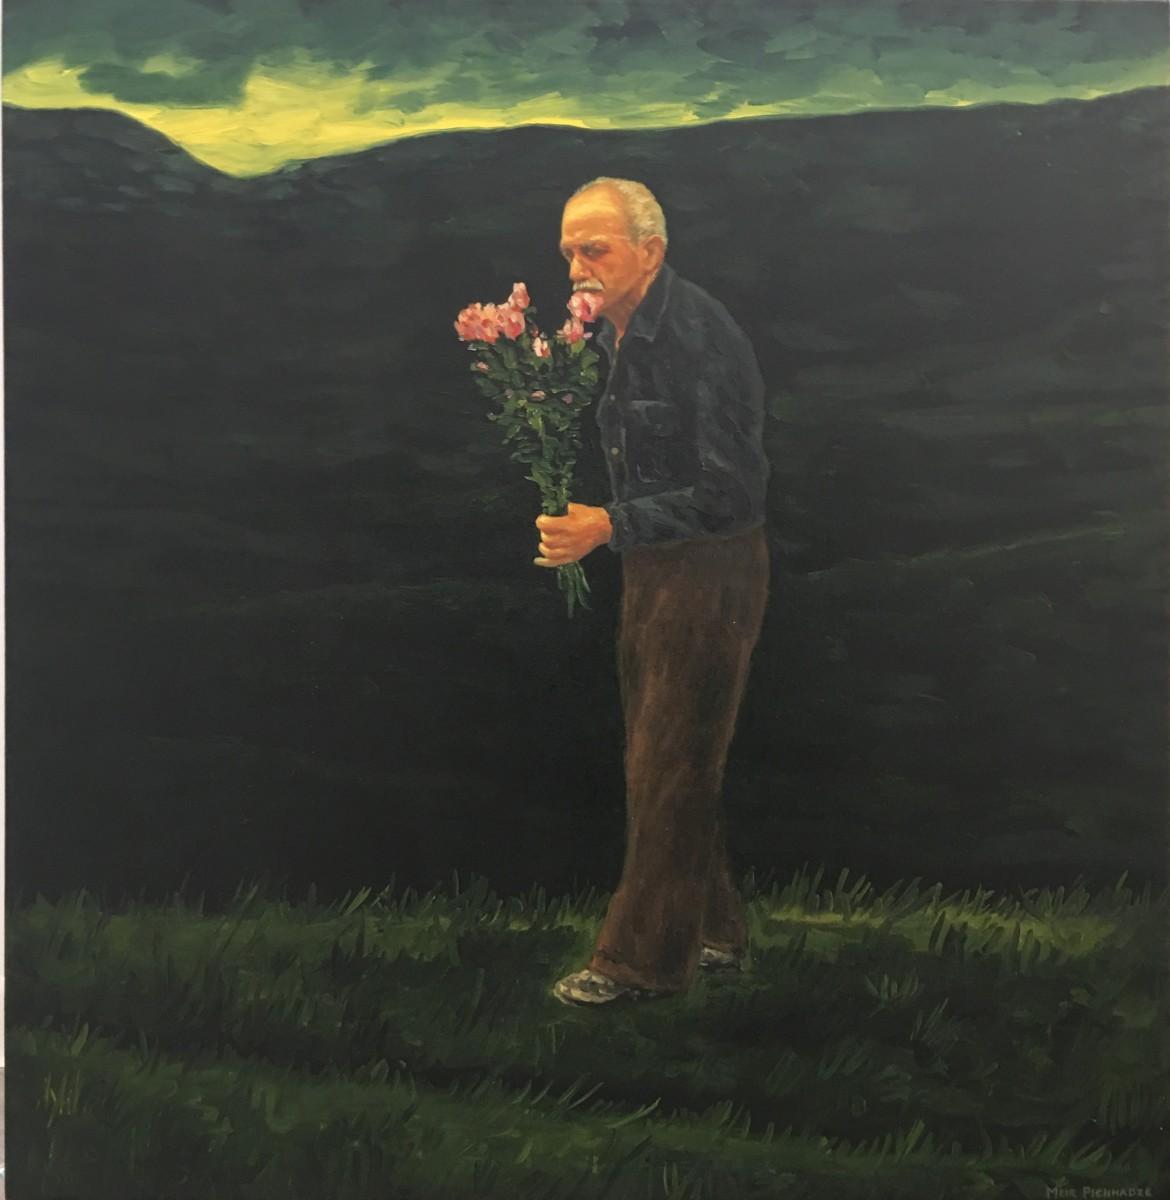 S-197, Meir Pichhadze, Oil on canvas, 85x79 cm 42,000 sekel